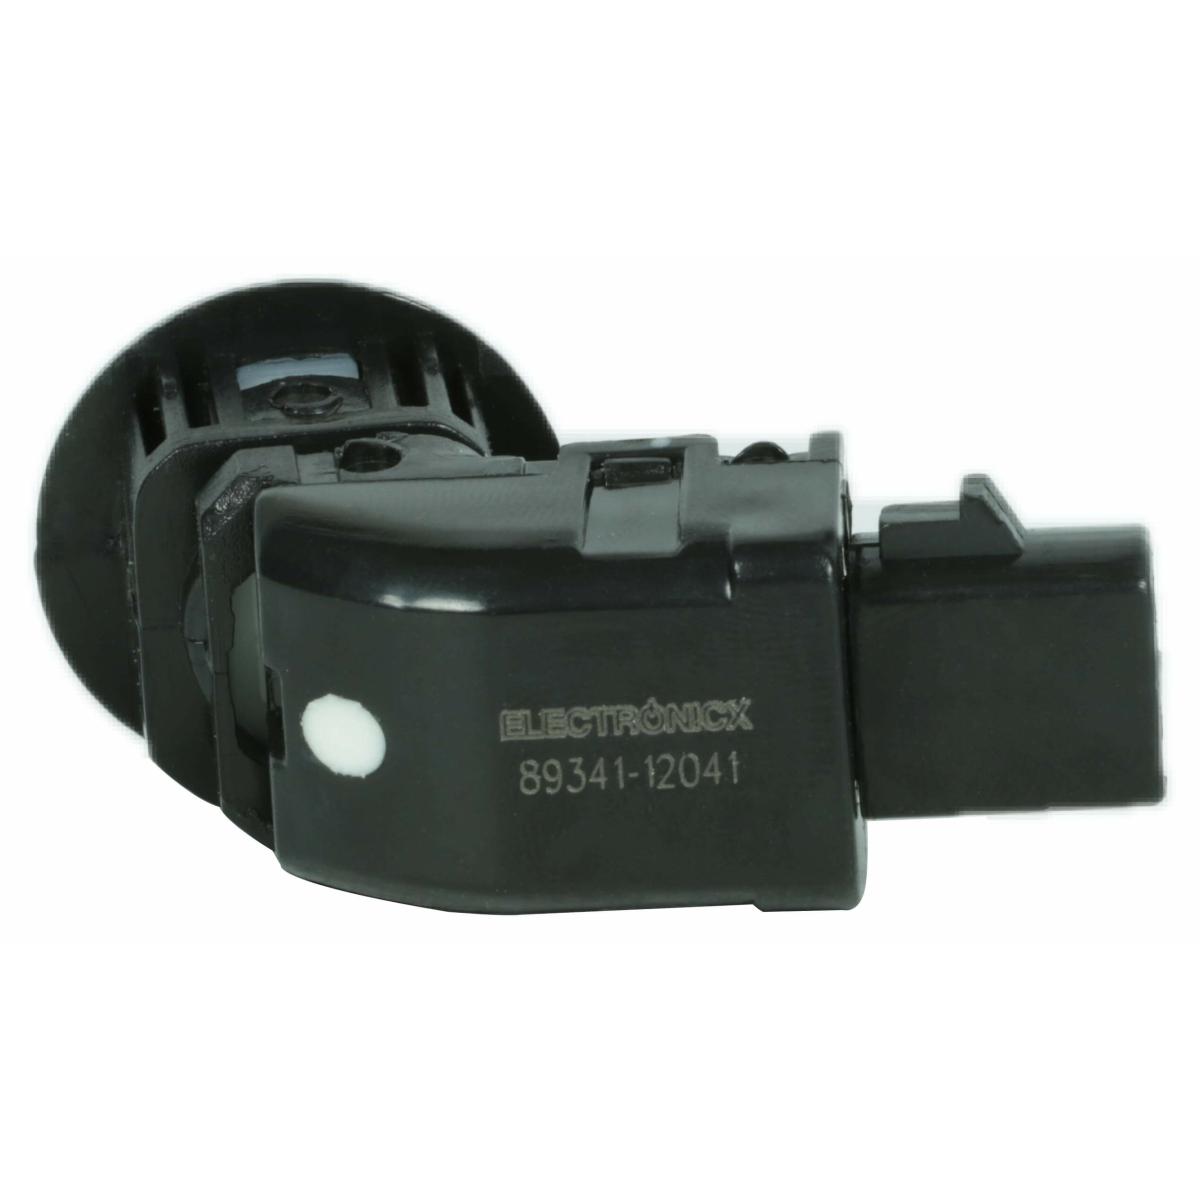 Parksensor 89341-12041 für Toyota PDC Parktronic